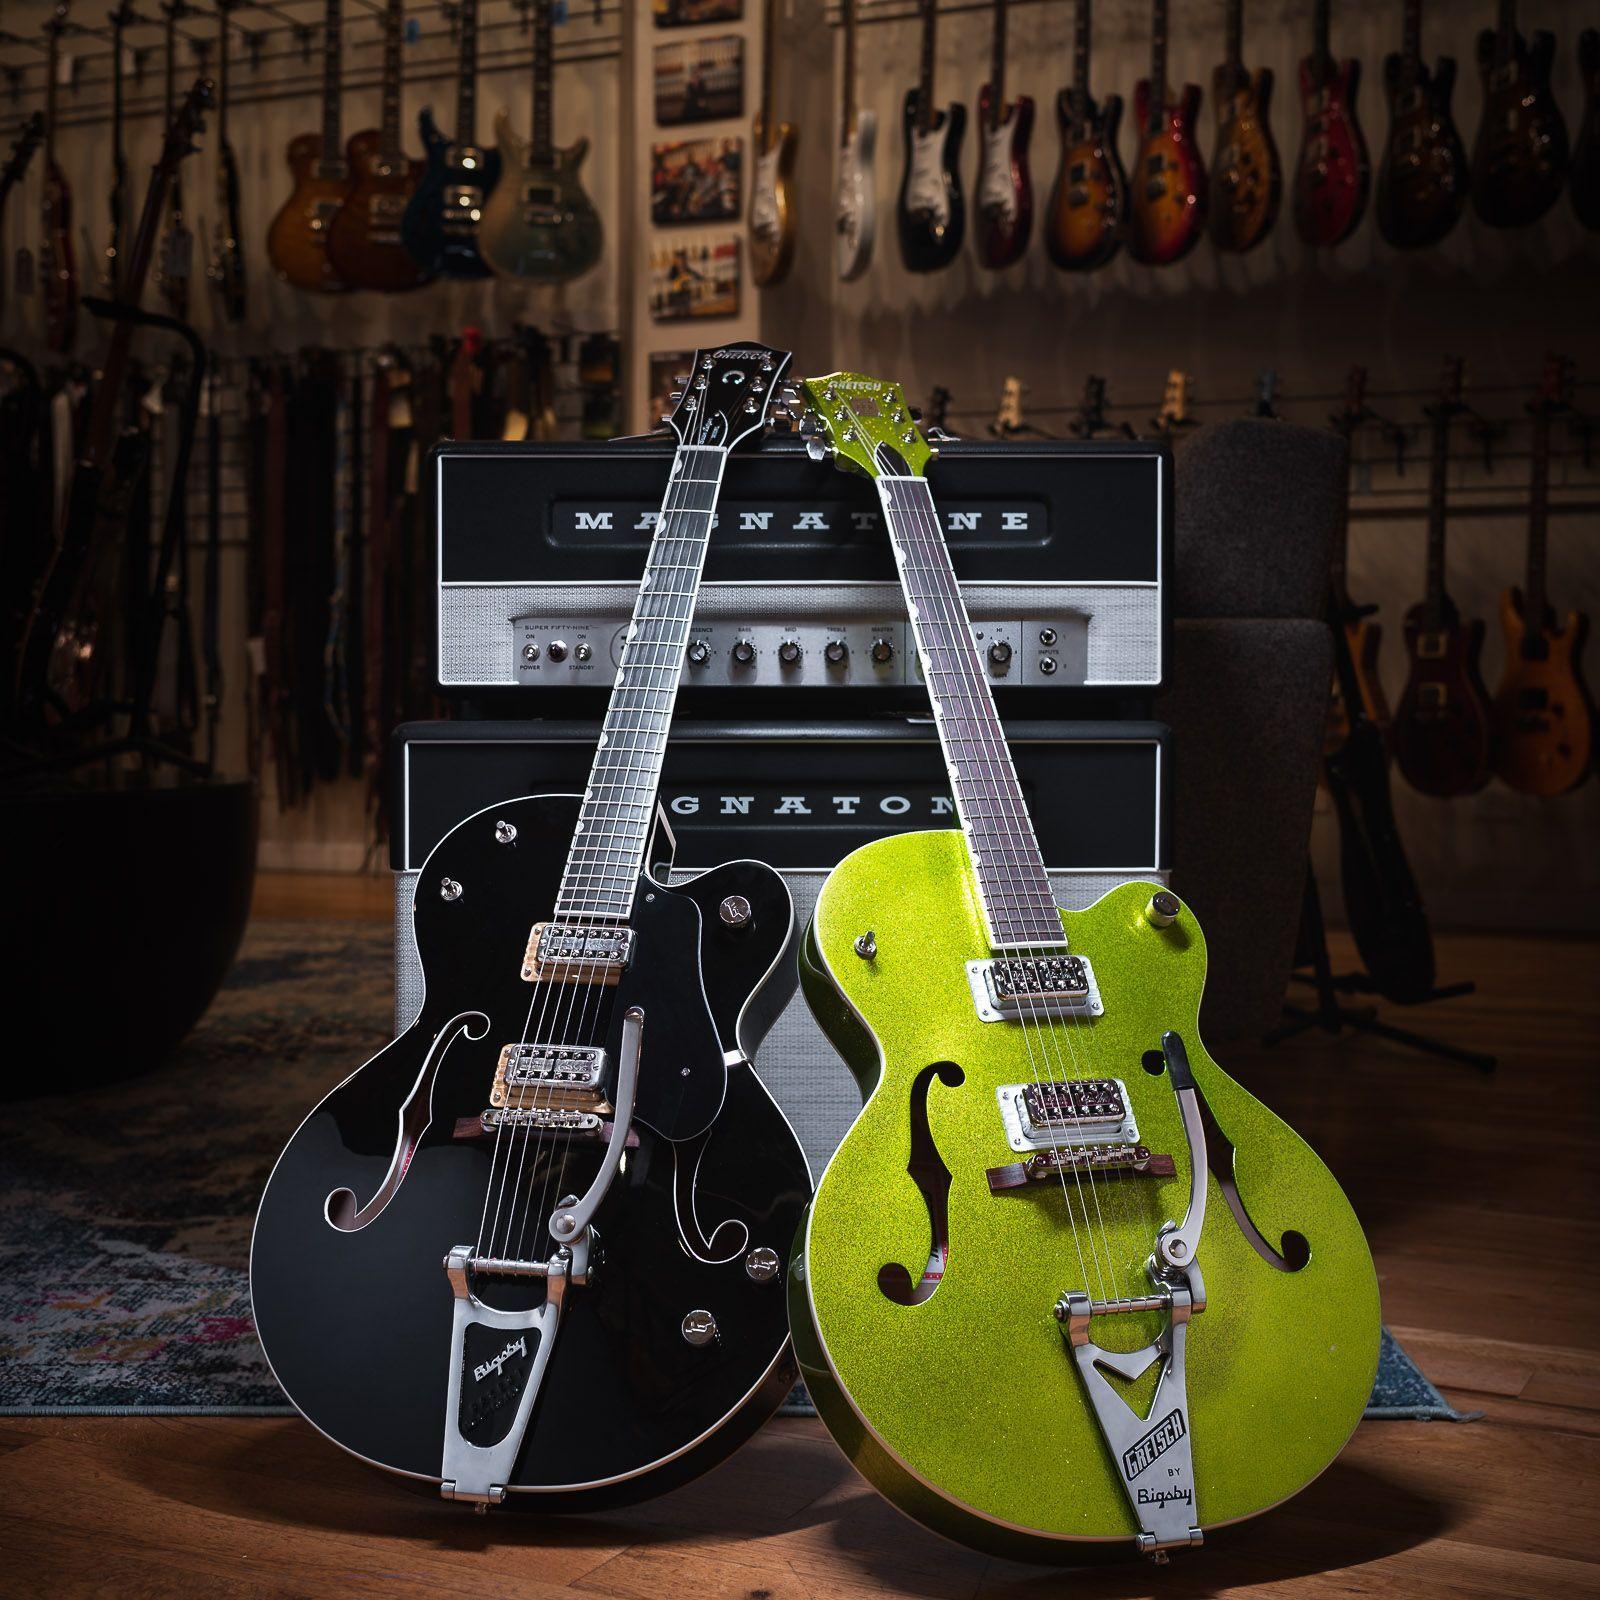 Imagen Sobre Guitarras De Steven Segura En Guitarras En 2020